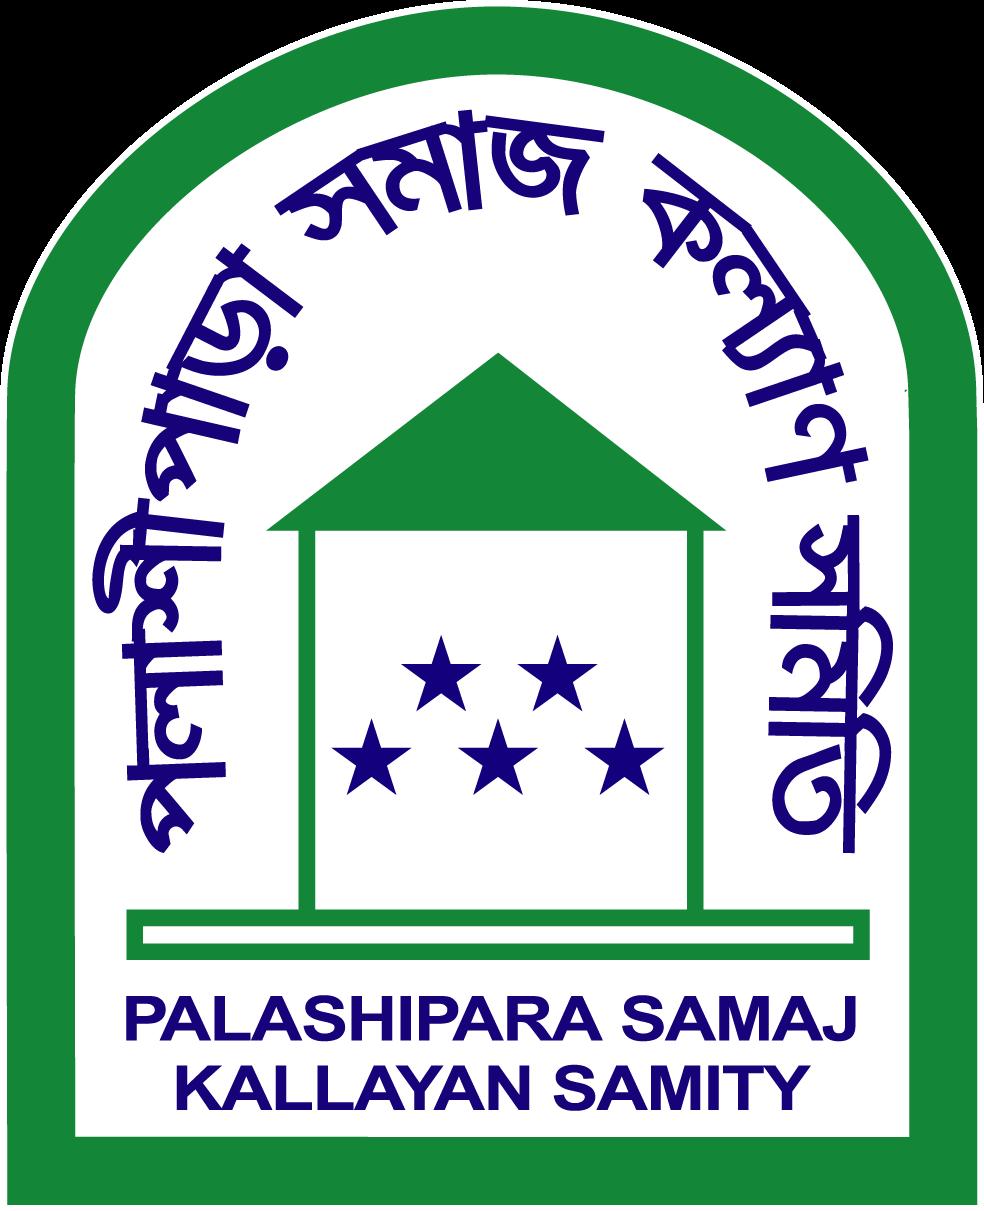 Palashipara Samaj Kallayan Samity